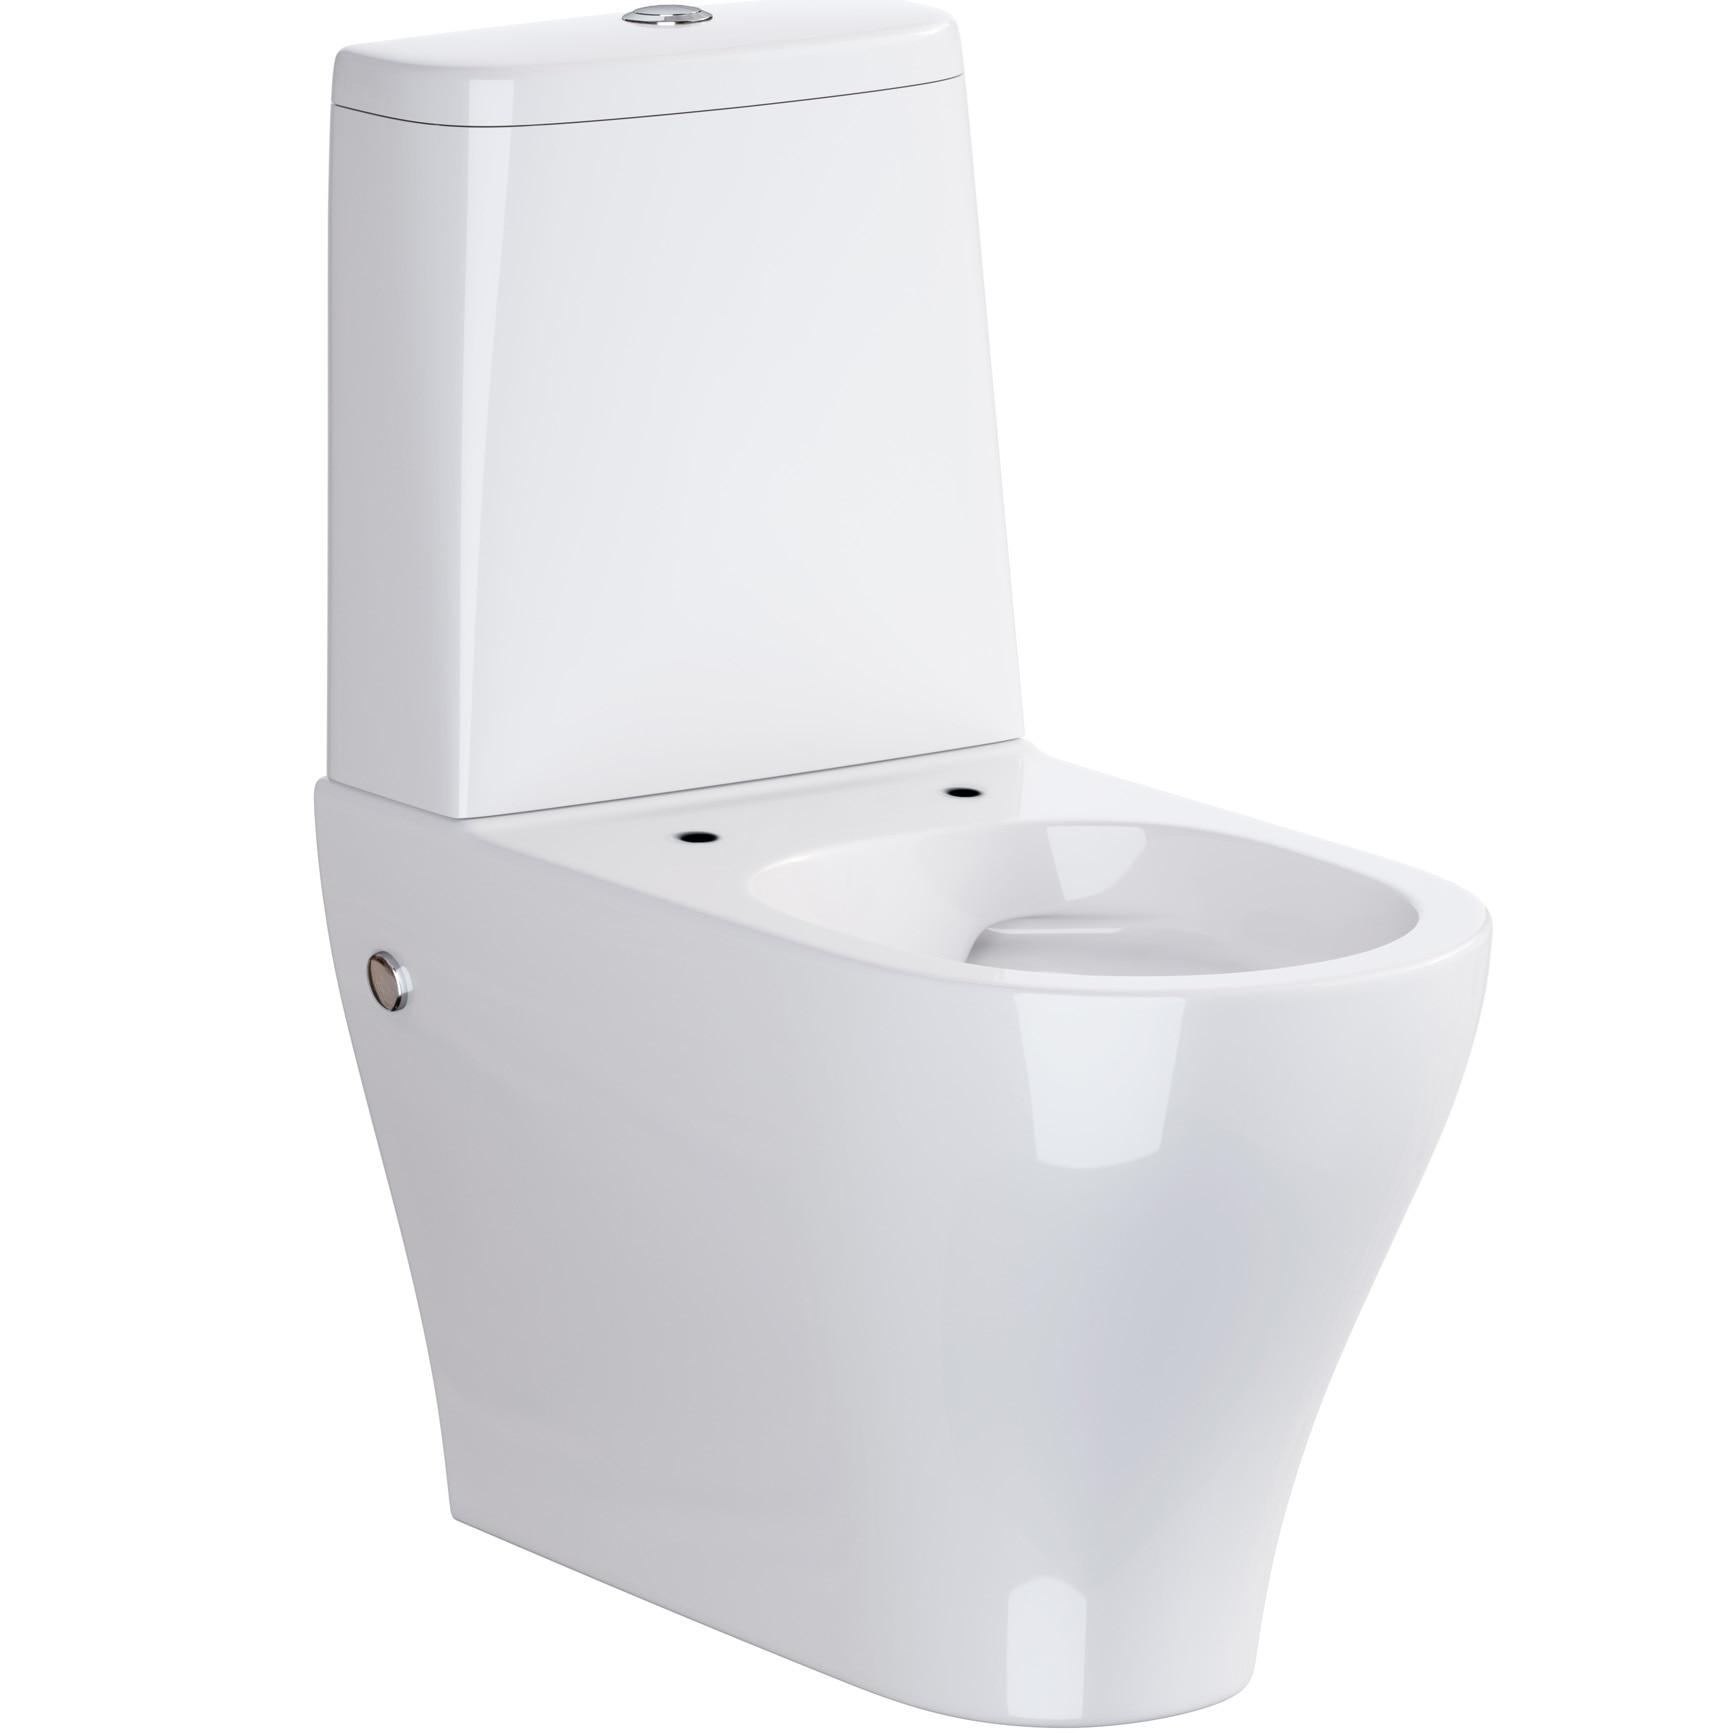 Fotografie Vas WC compact Cersanit Urban Harmony OK580-009-BOX, 010/020, cleanon fara capac